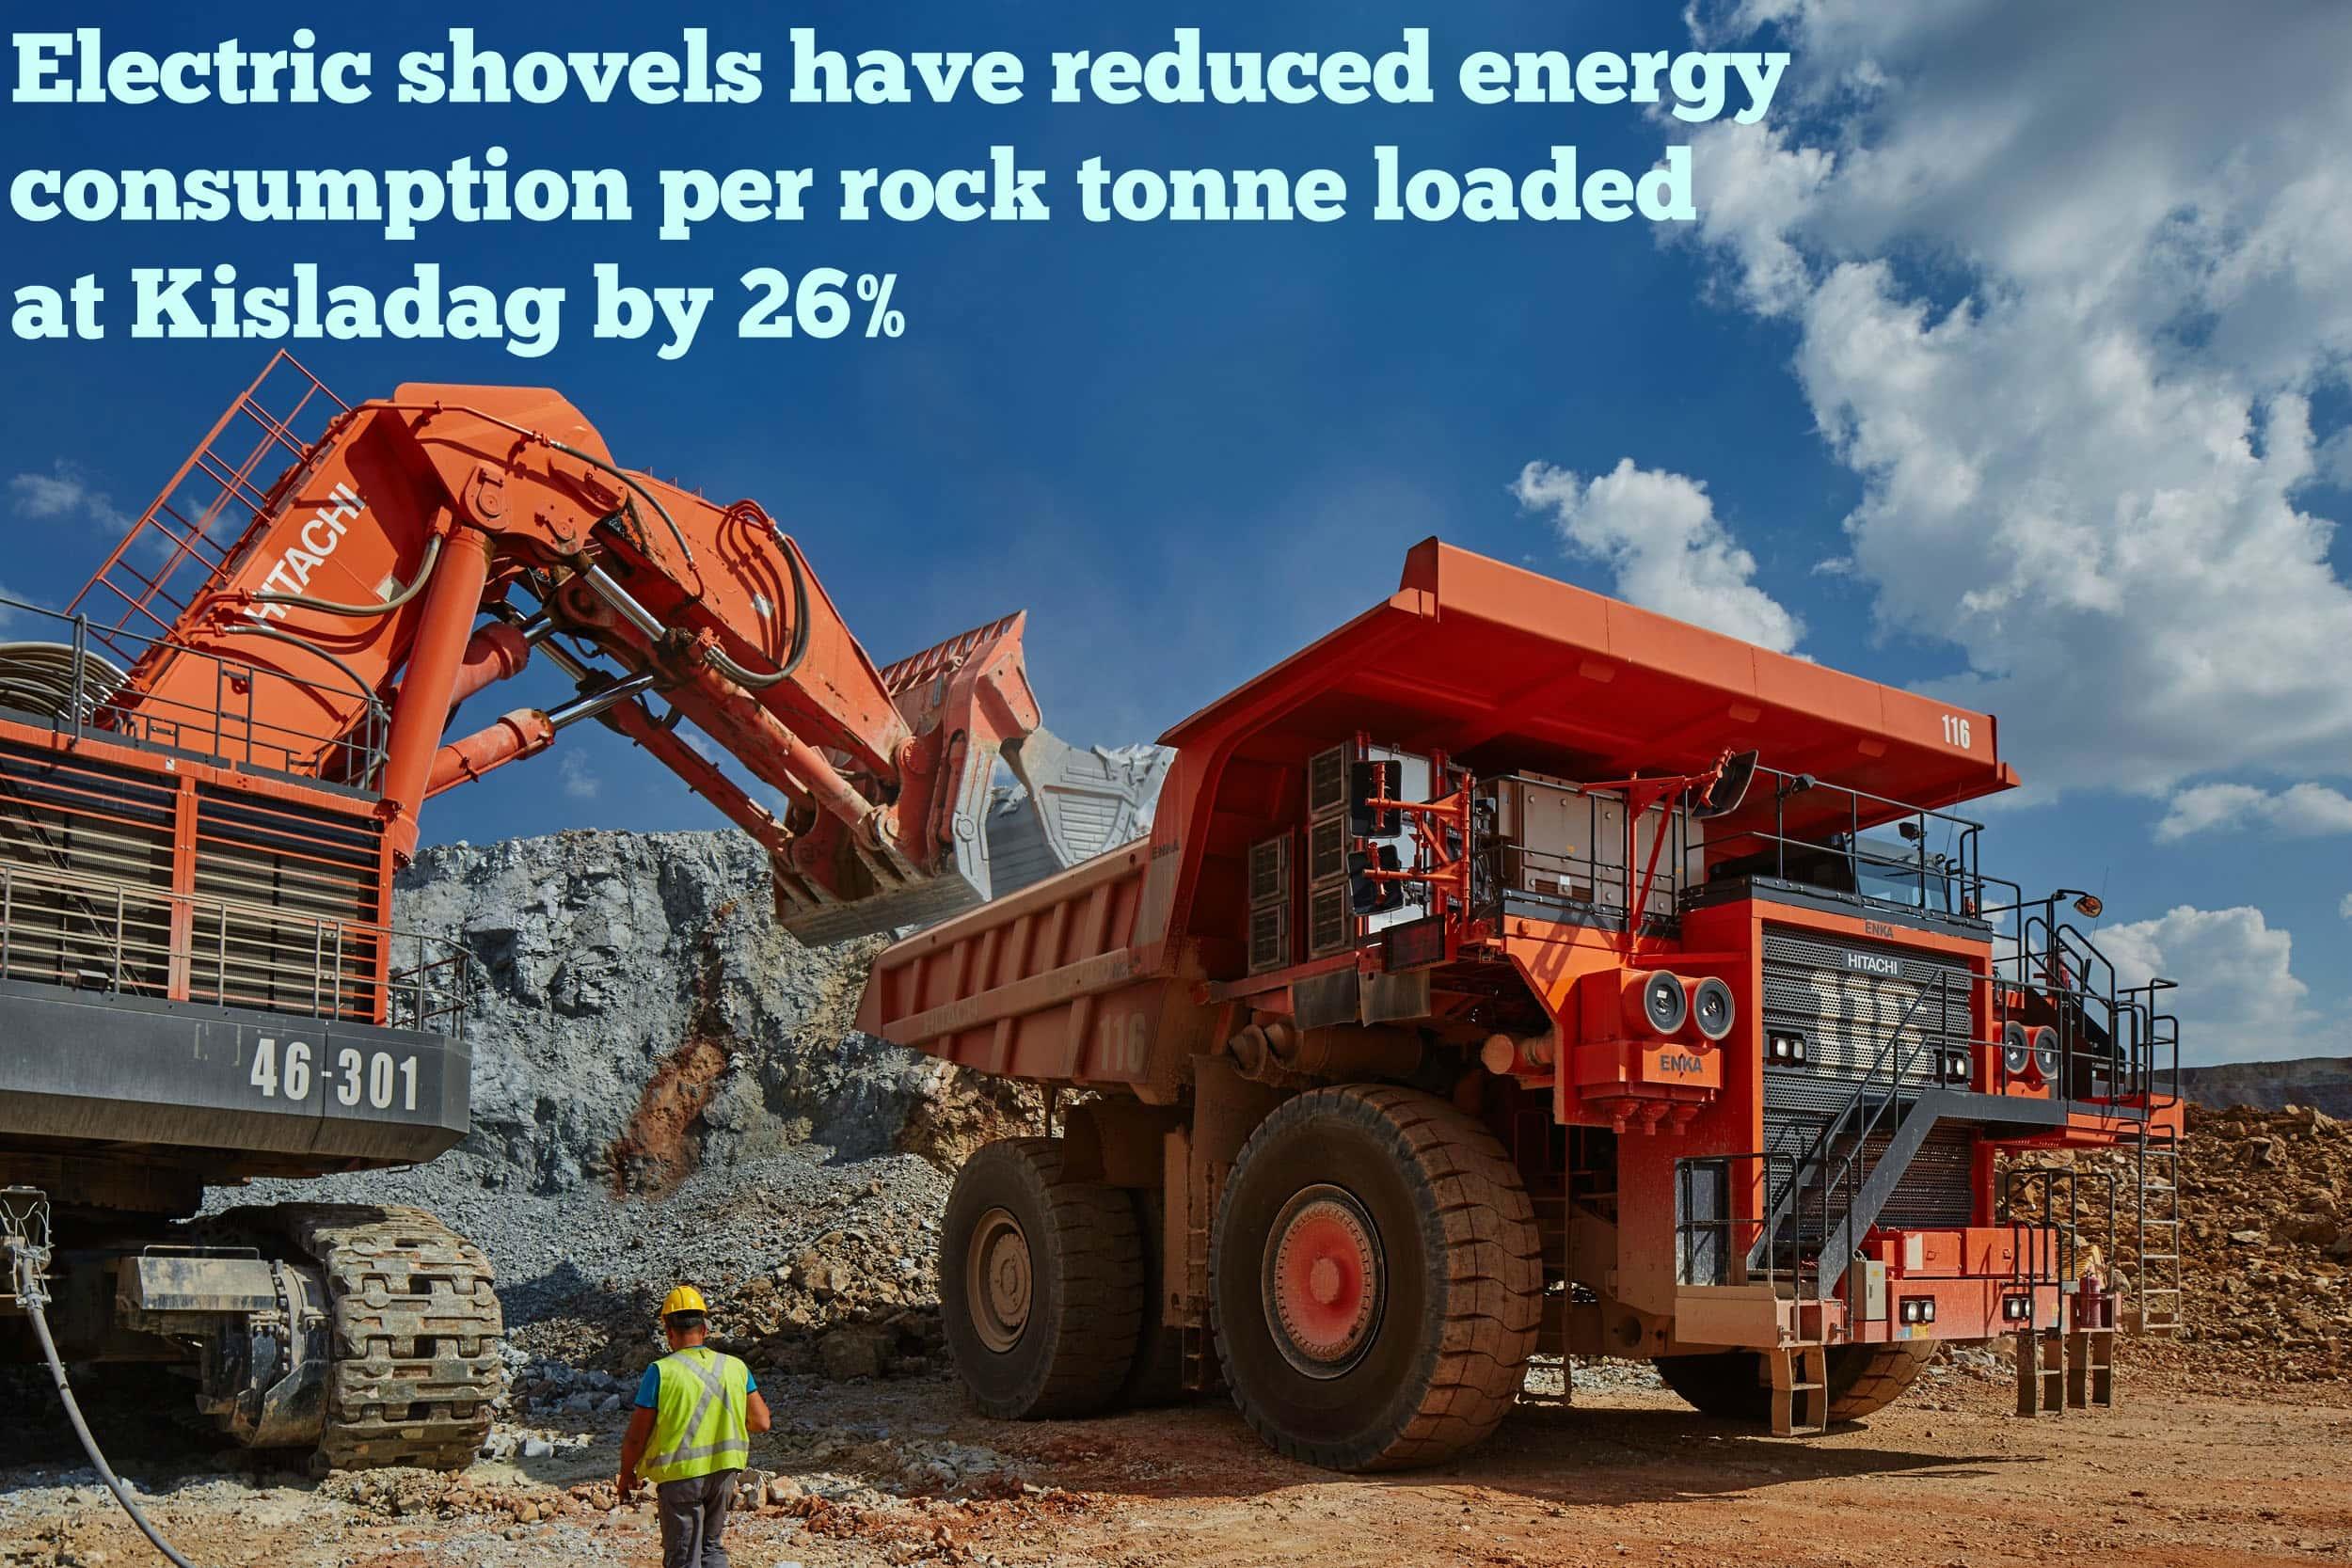 Electronic shovels have reduced energy consumption at Eldorado Gold